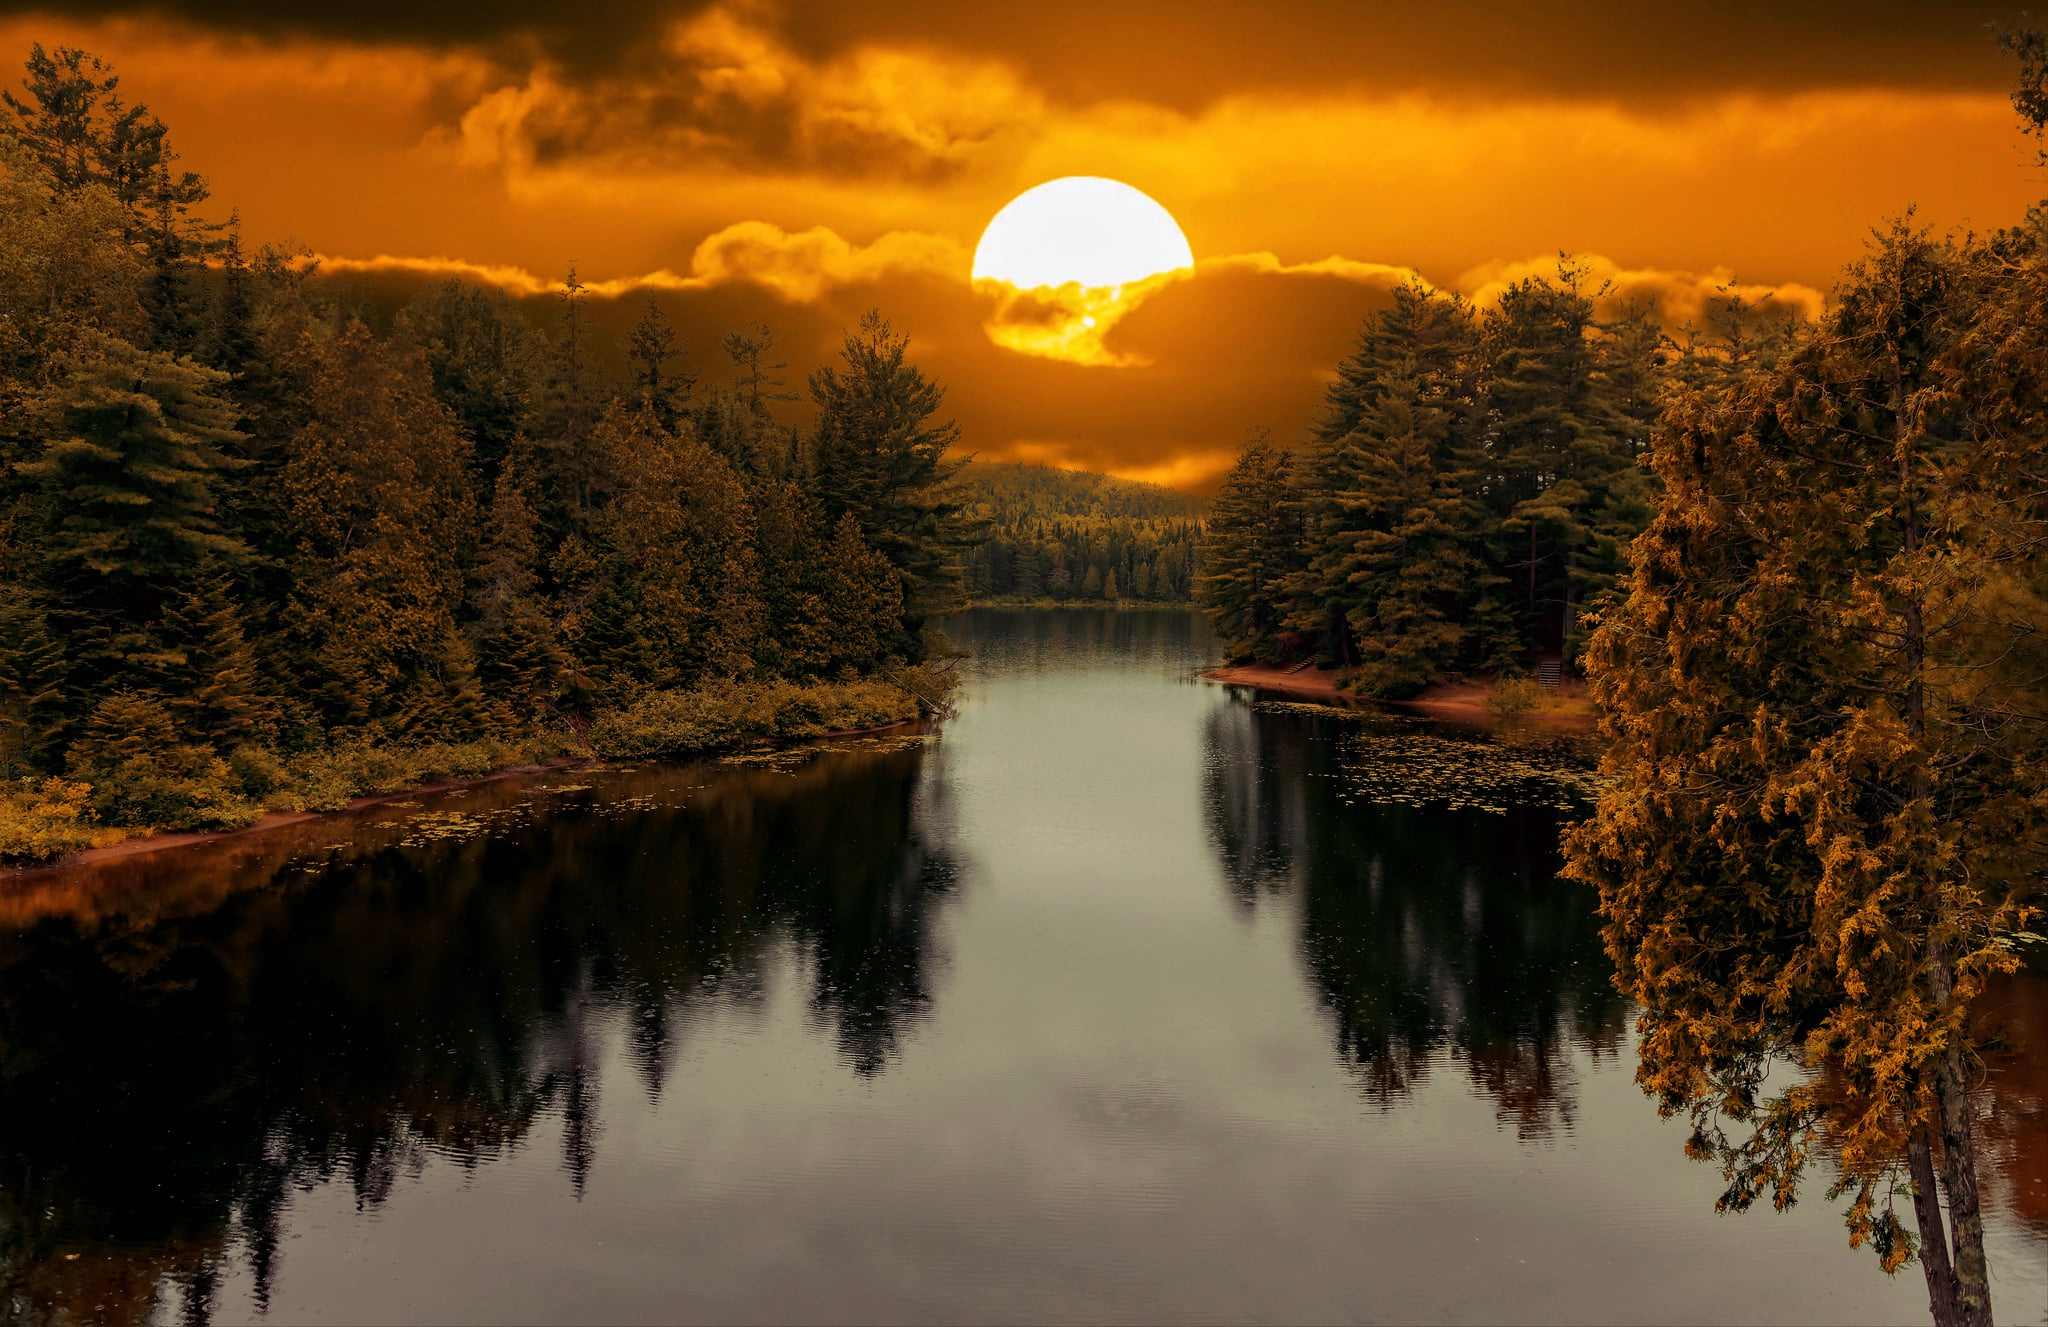 Forest Sun Reflection 2048x1327